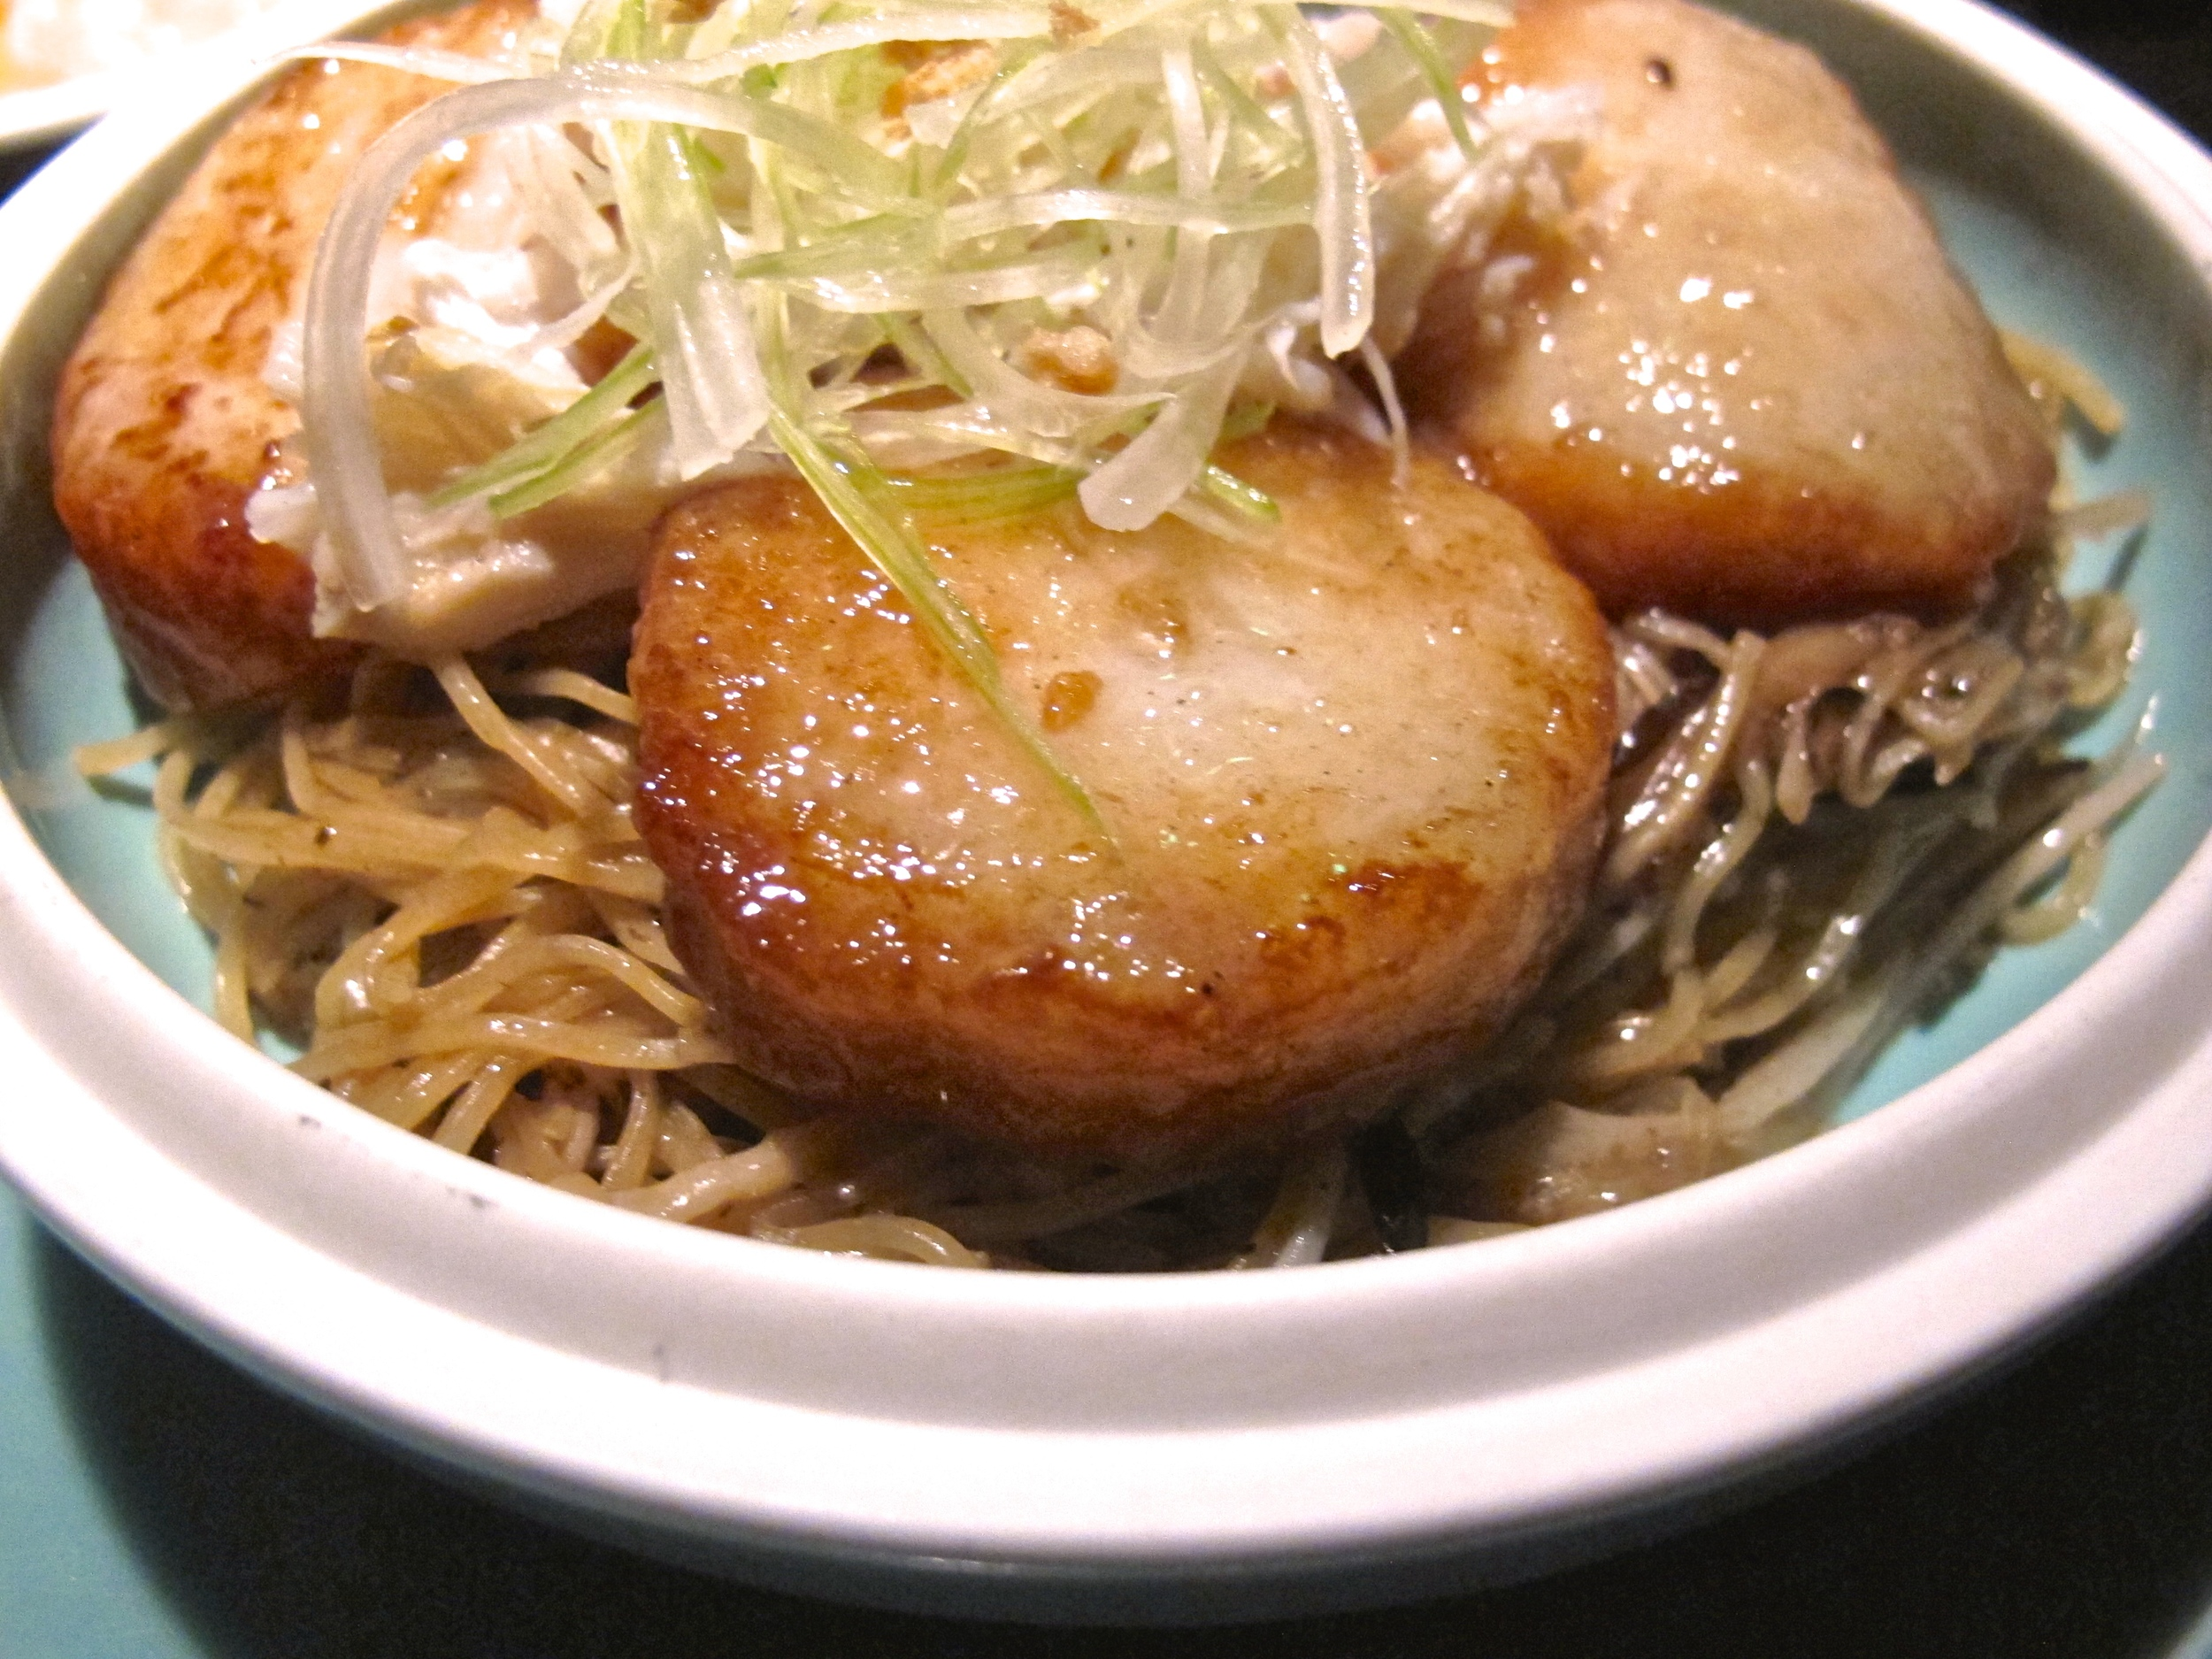 Hakkasan's truffle noodles